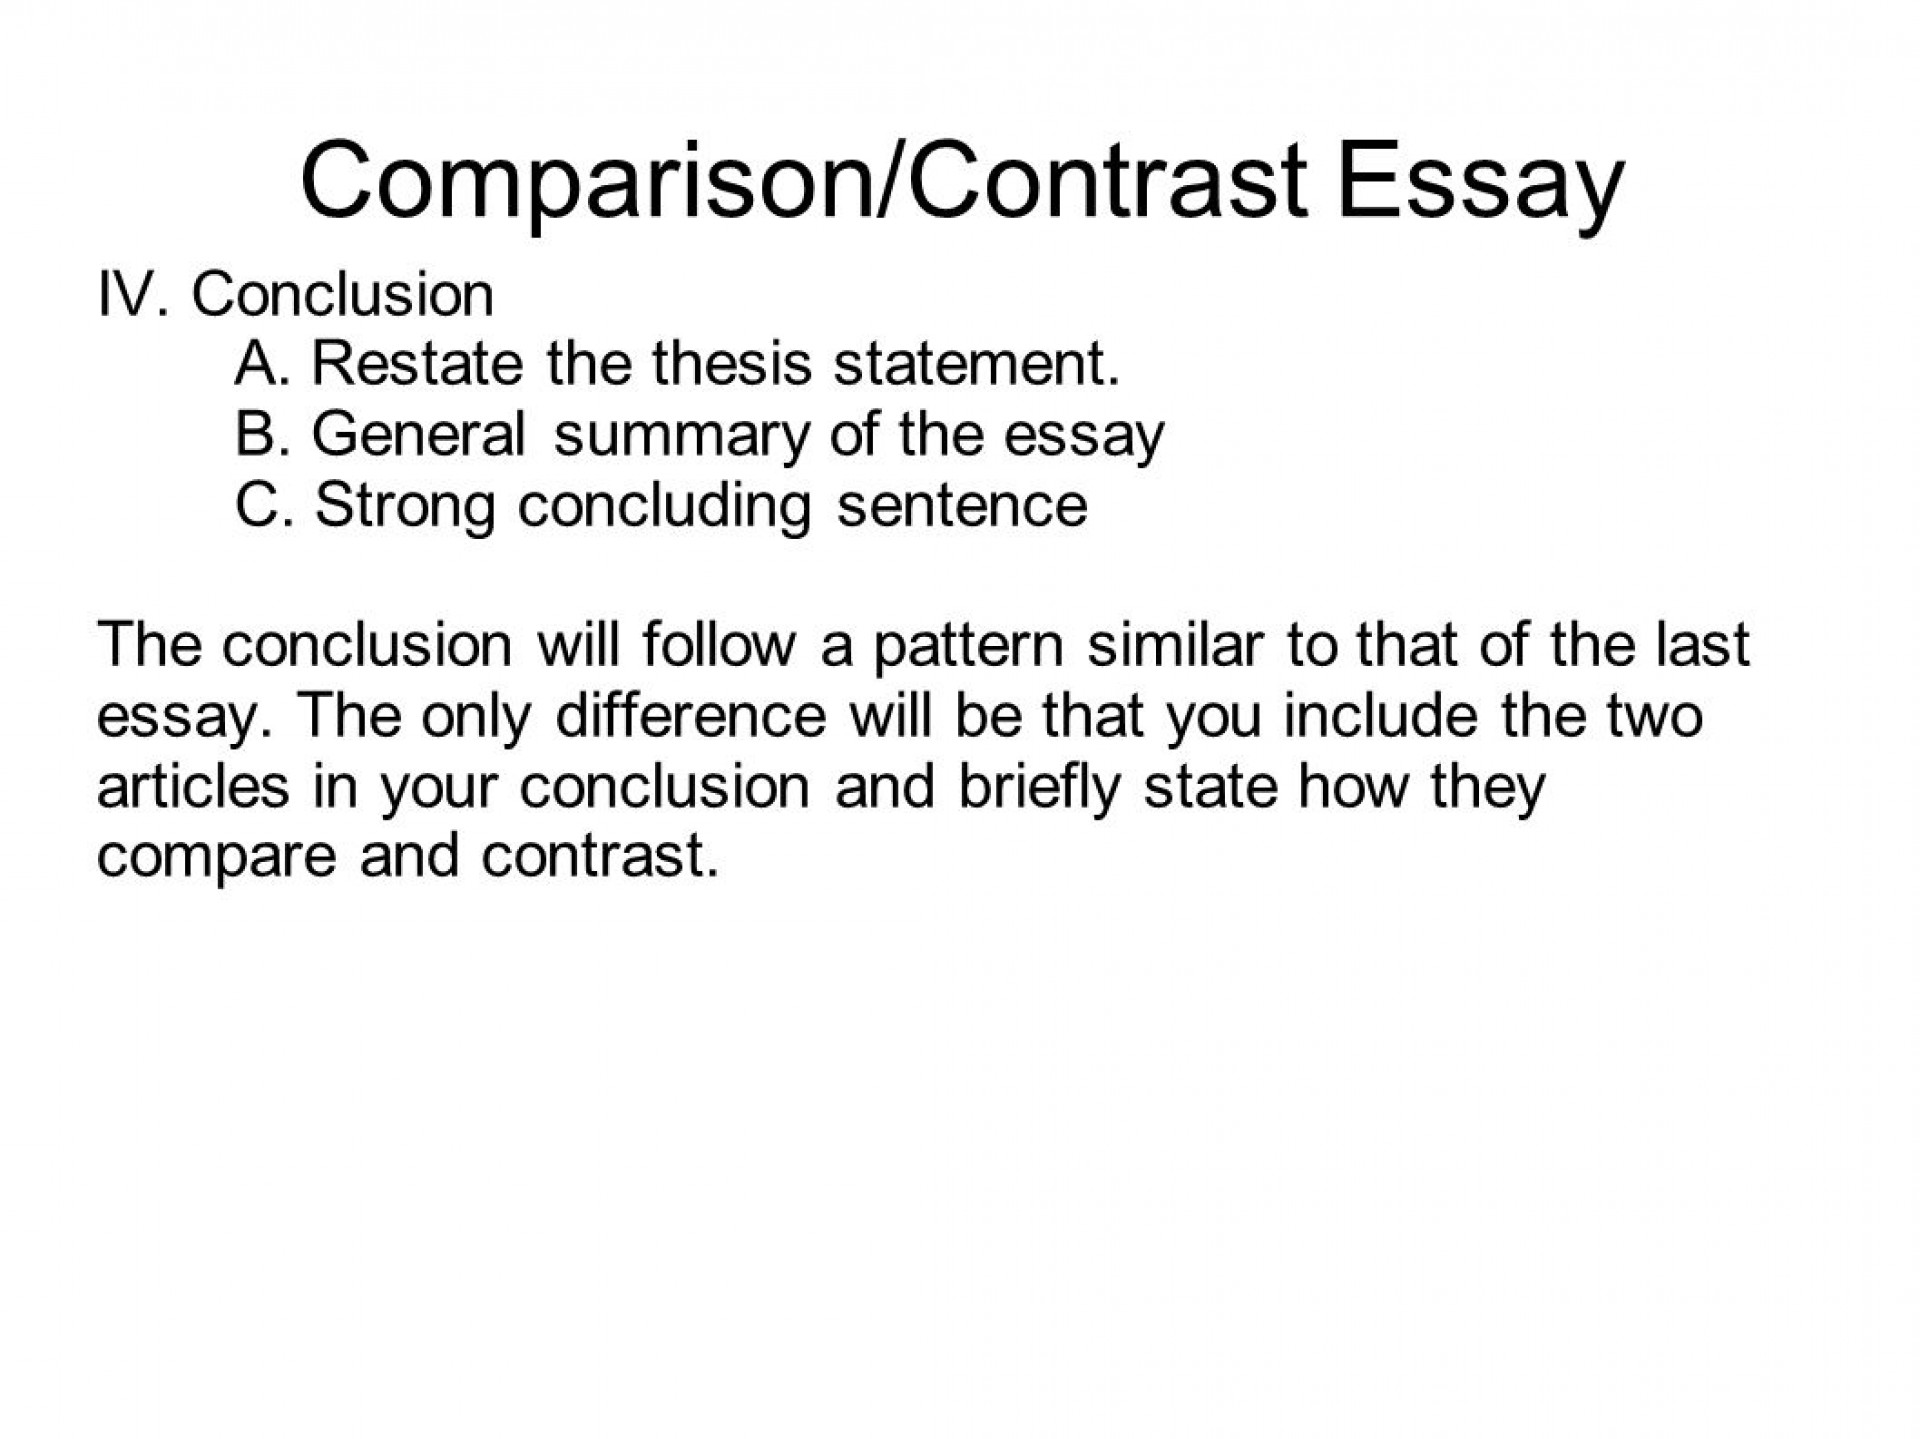 021 How To Write Compare And Contrast Essay Good Essays Conclusion Paragraph For Career Portfolios Sli Nursing Writing Senior Reflective Striking University Sample 1920